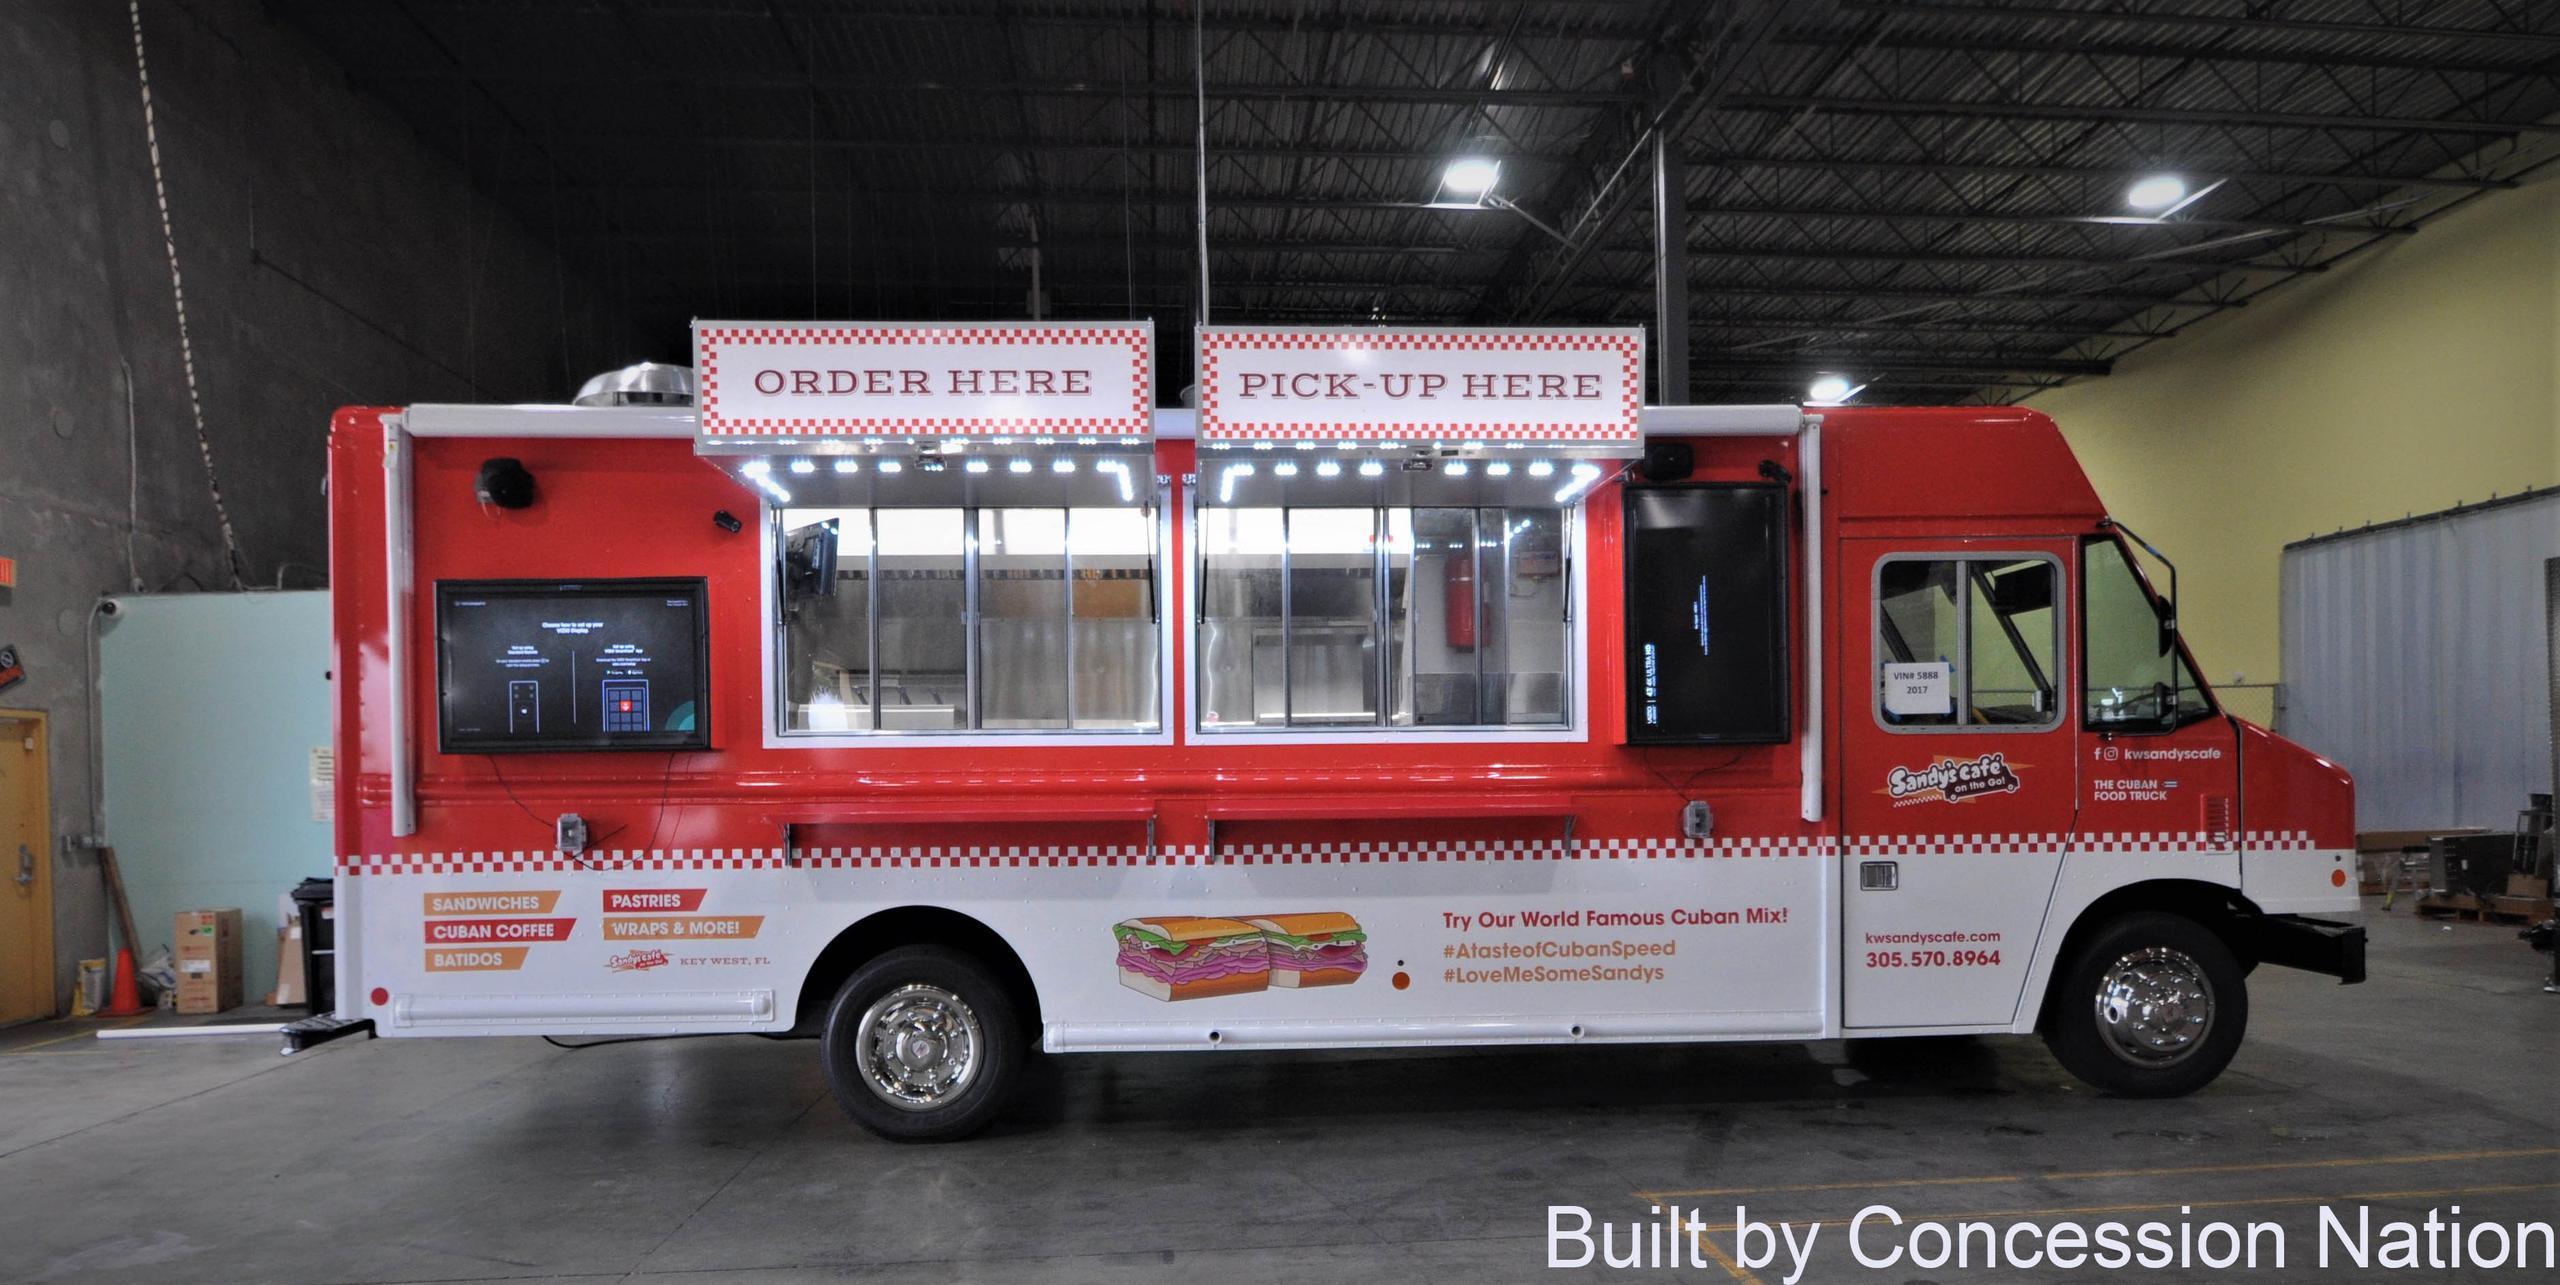 Sandy's Food Truck - Digital Menu Board